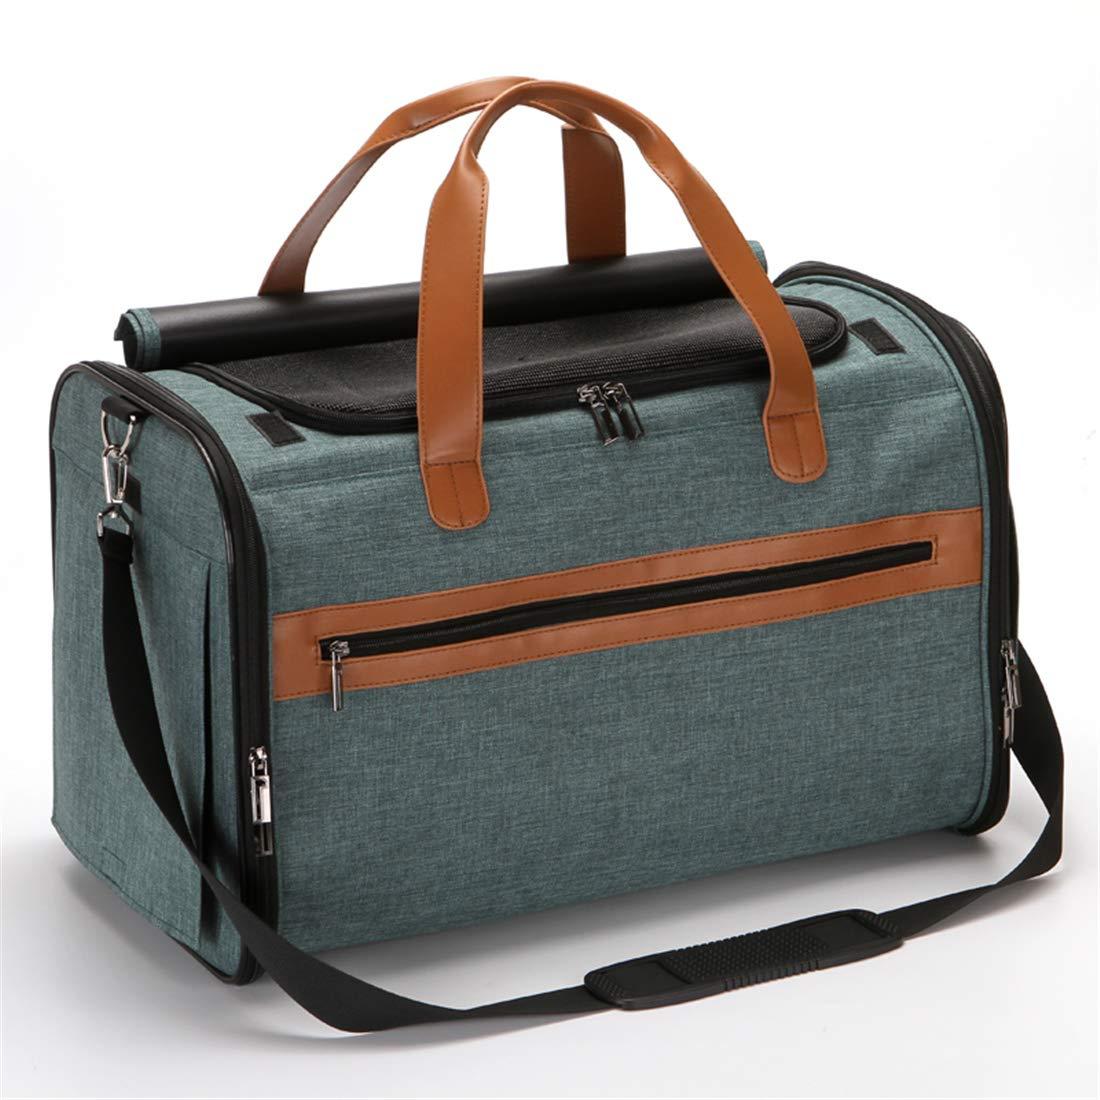 A Cyan 19.6L11W12.5H inch Hidden Type Travel Folding Pet Pack Adjustable Single Shoulder Bag Handbag 19.6L11W12.5H Inch